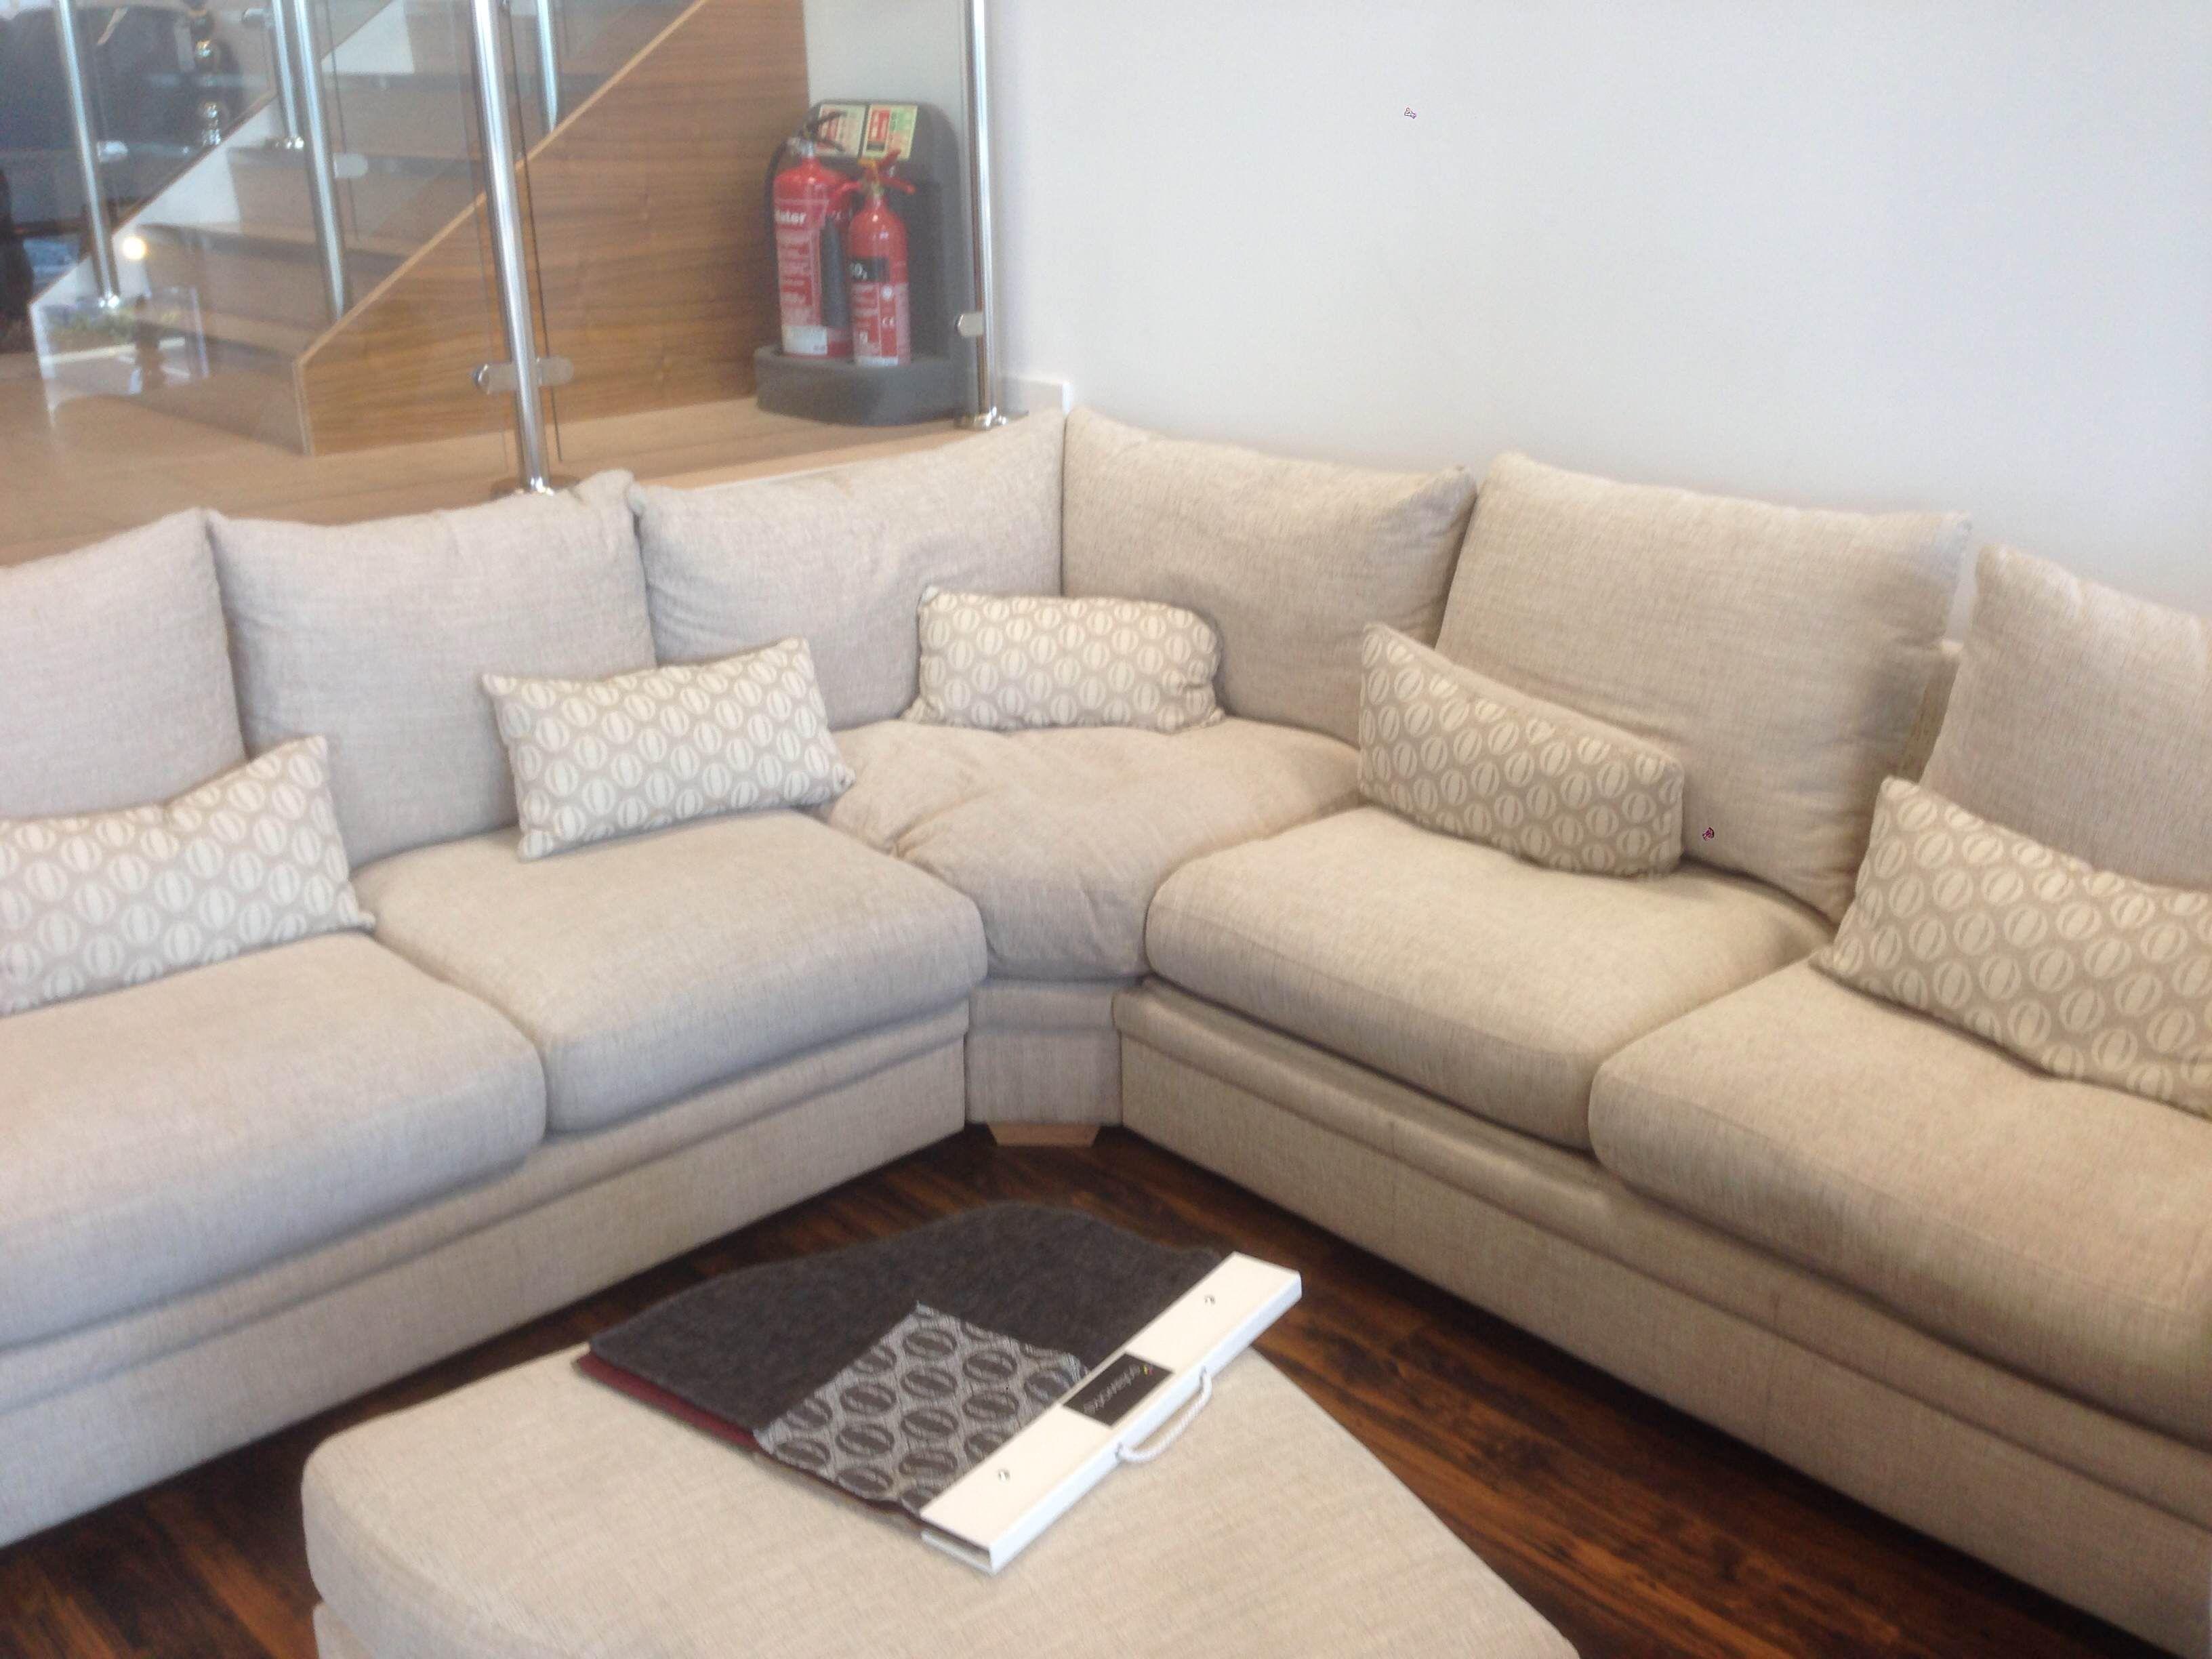 hot sale online 89dc6 d47d4 SofaWorks corner - Mango | Sofa in 2019 | Sofa, Home, Room